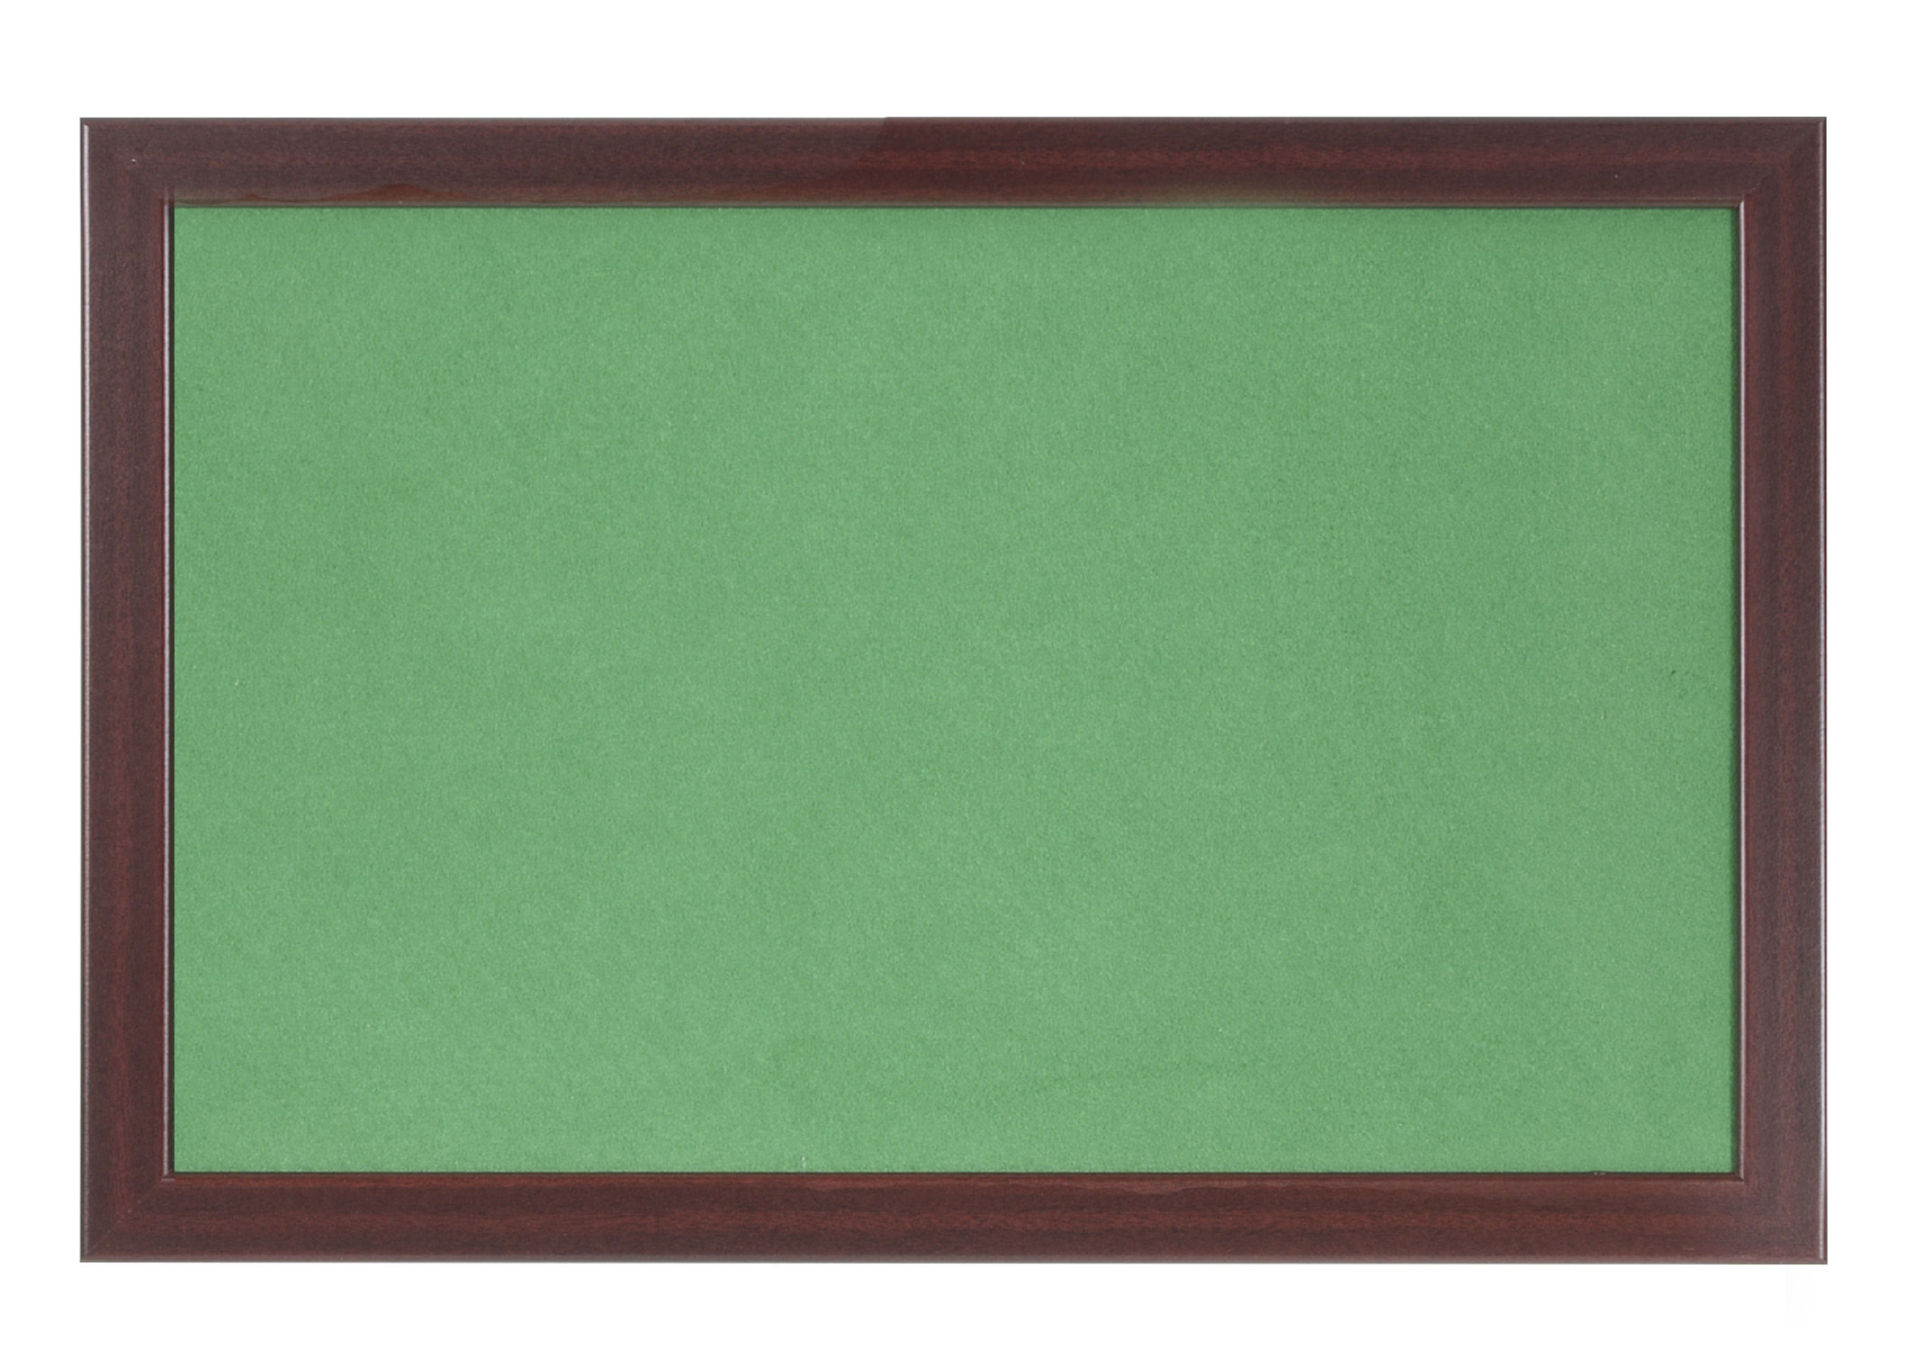 Felt Bi-Office Earth-It Green Felt Noticeboard Cherry Wood Frame 1200x900mm